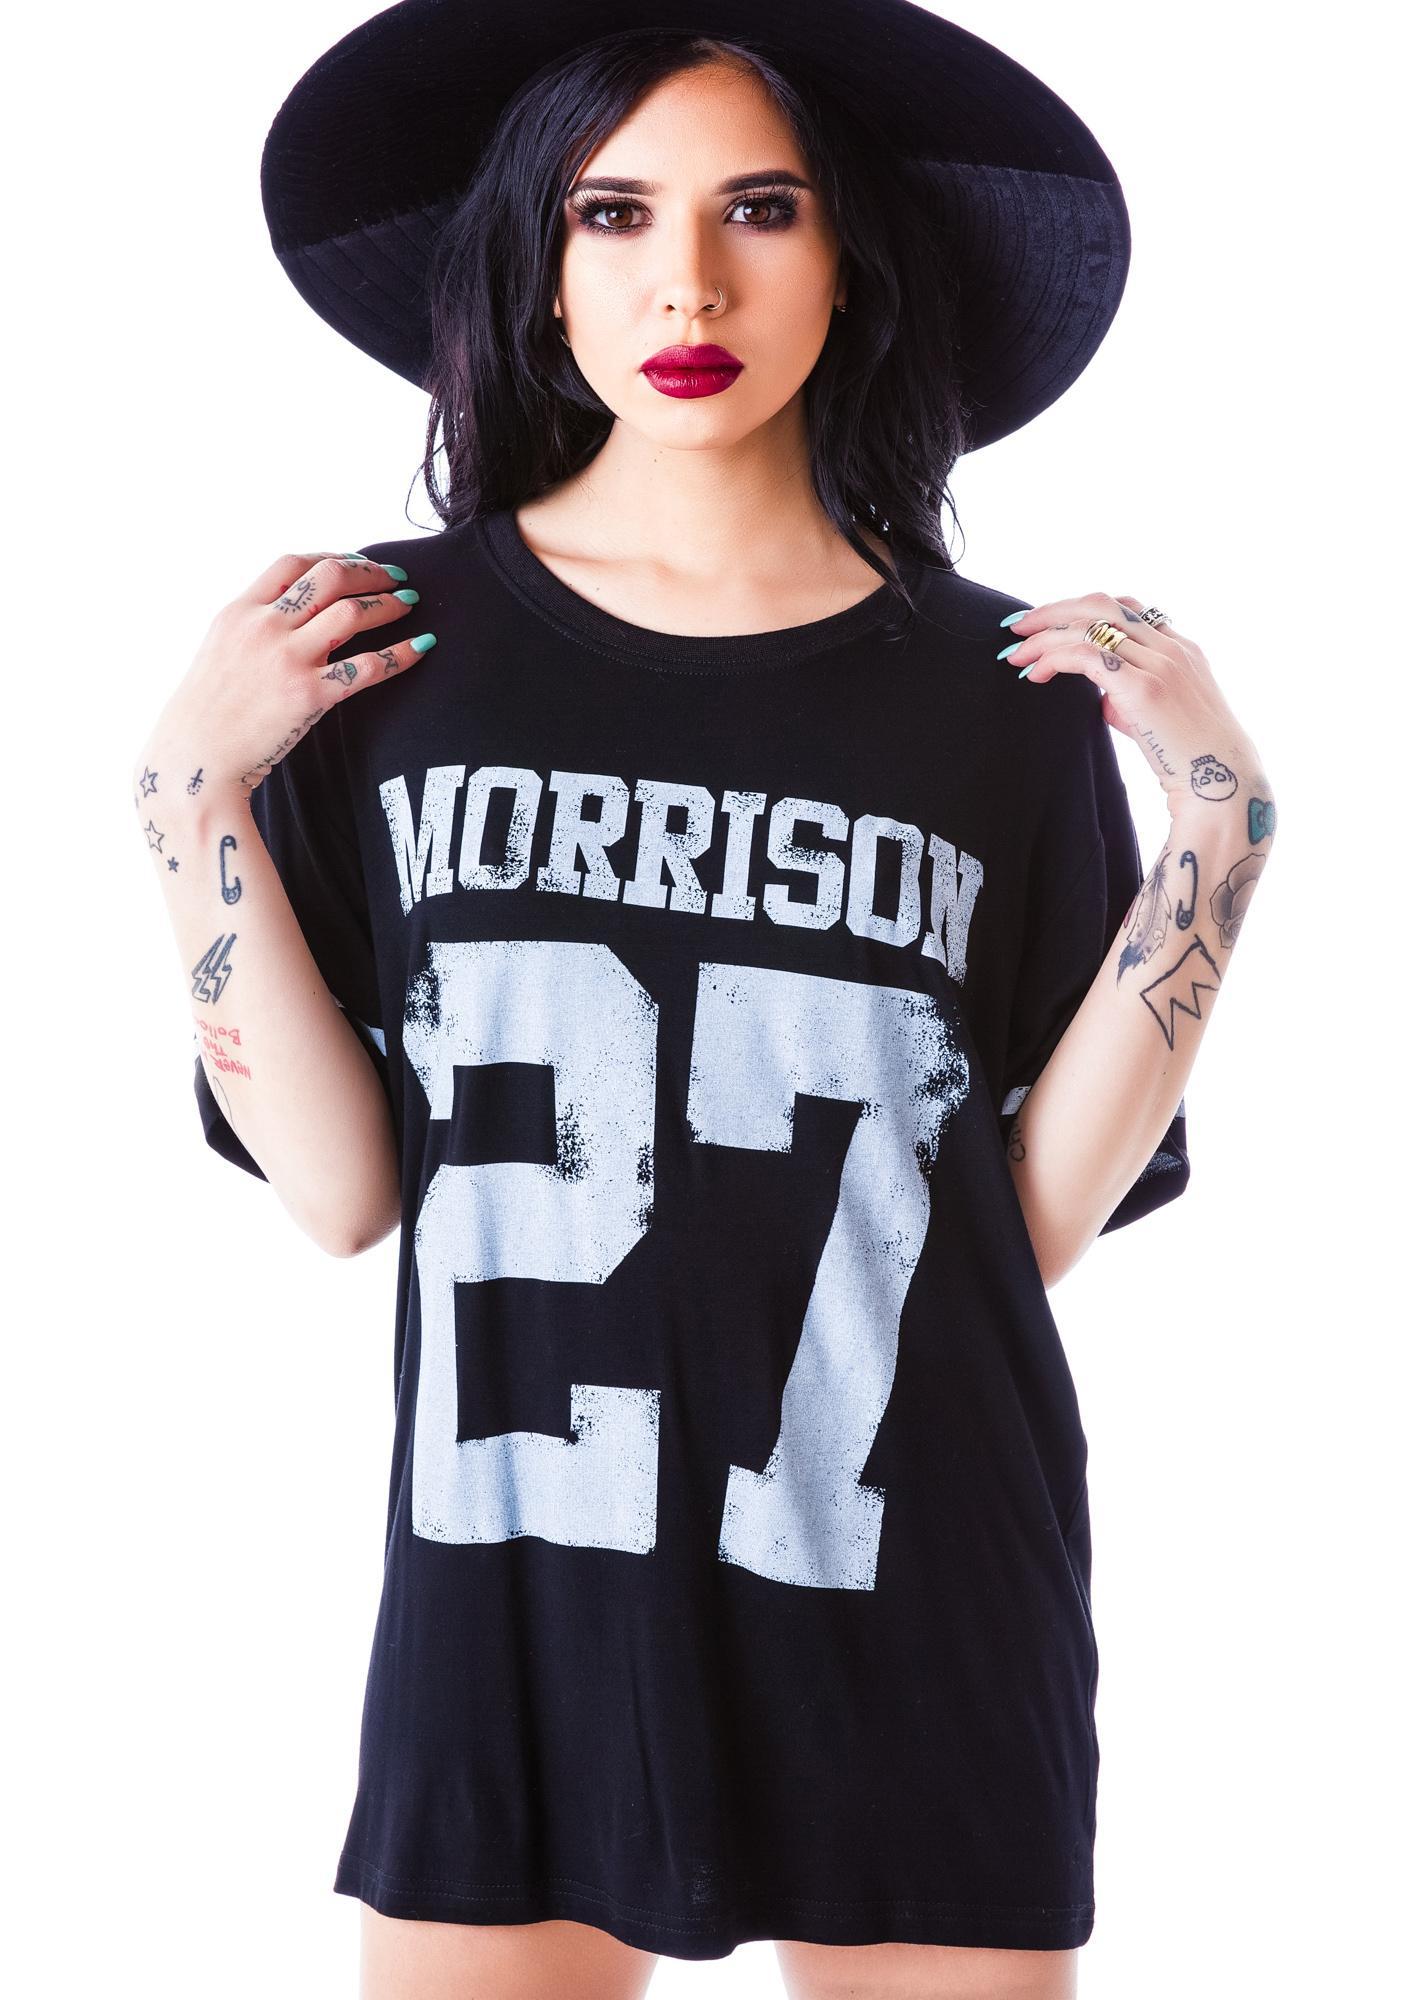 Ruby Starling Morrison 27 Tee